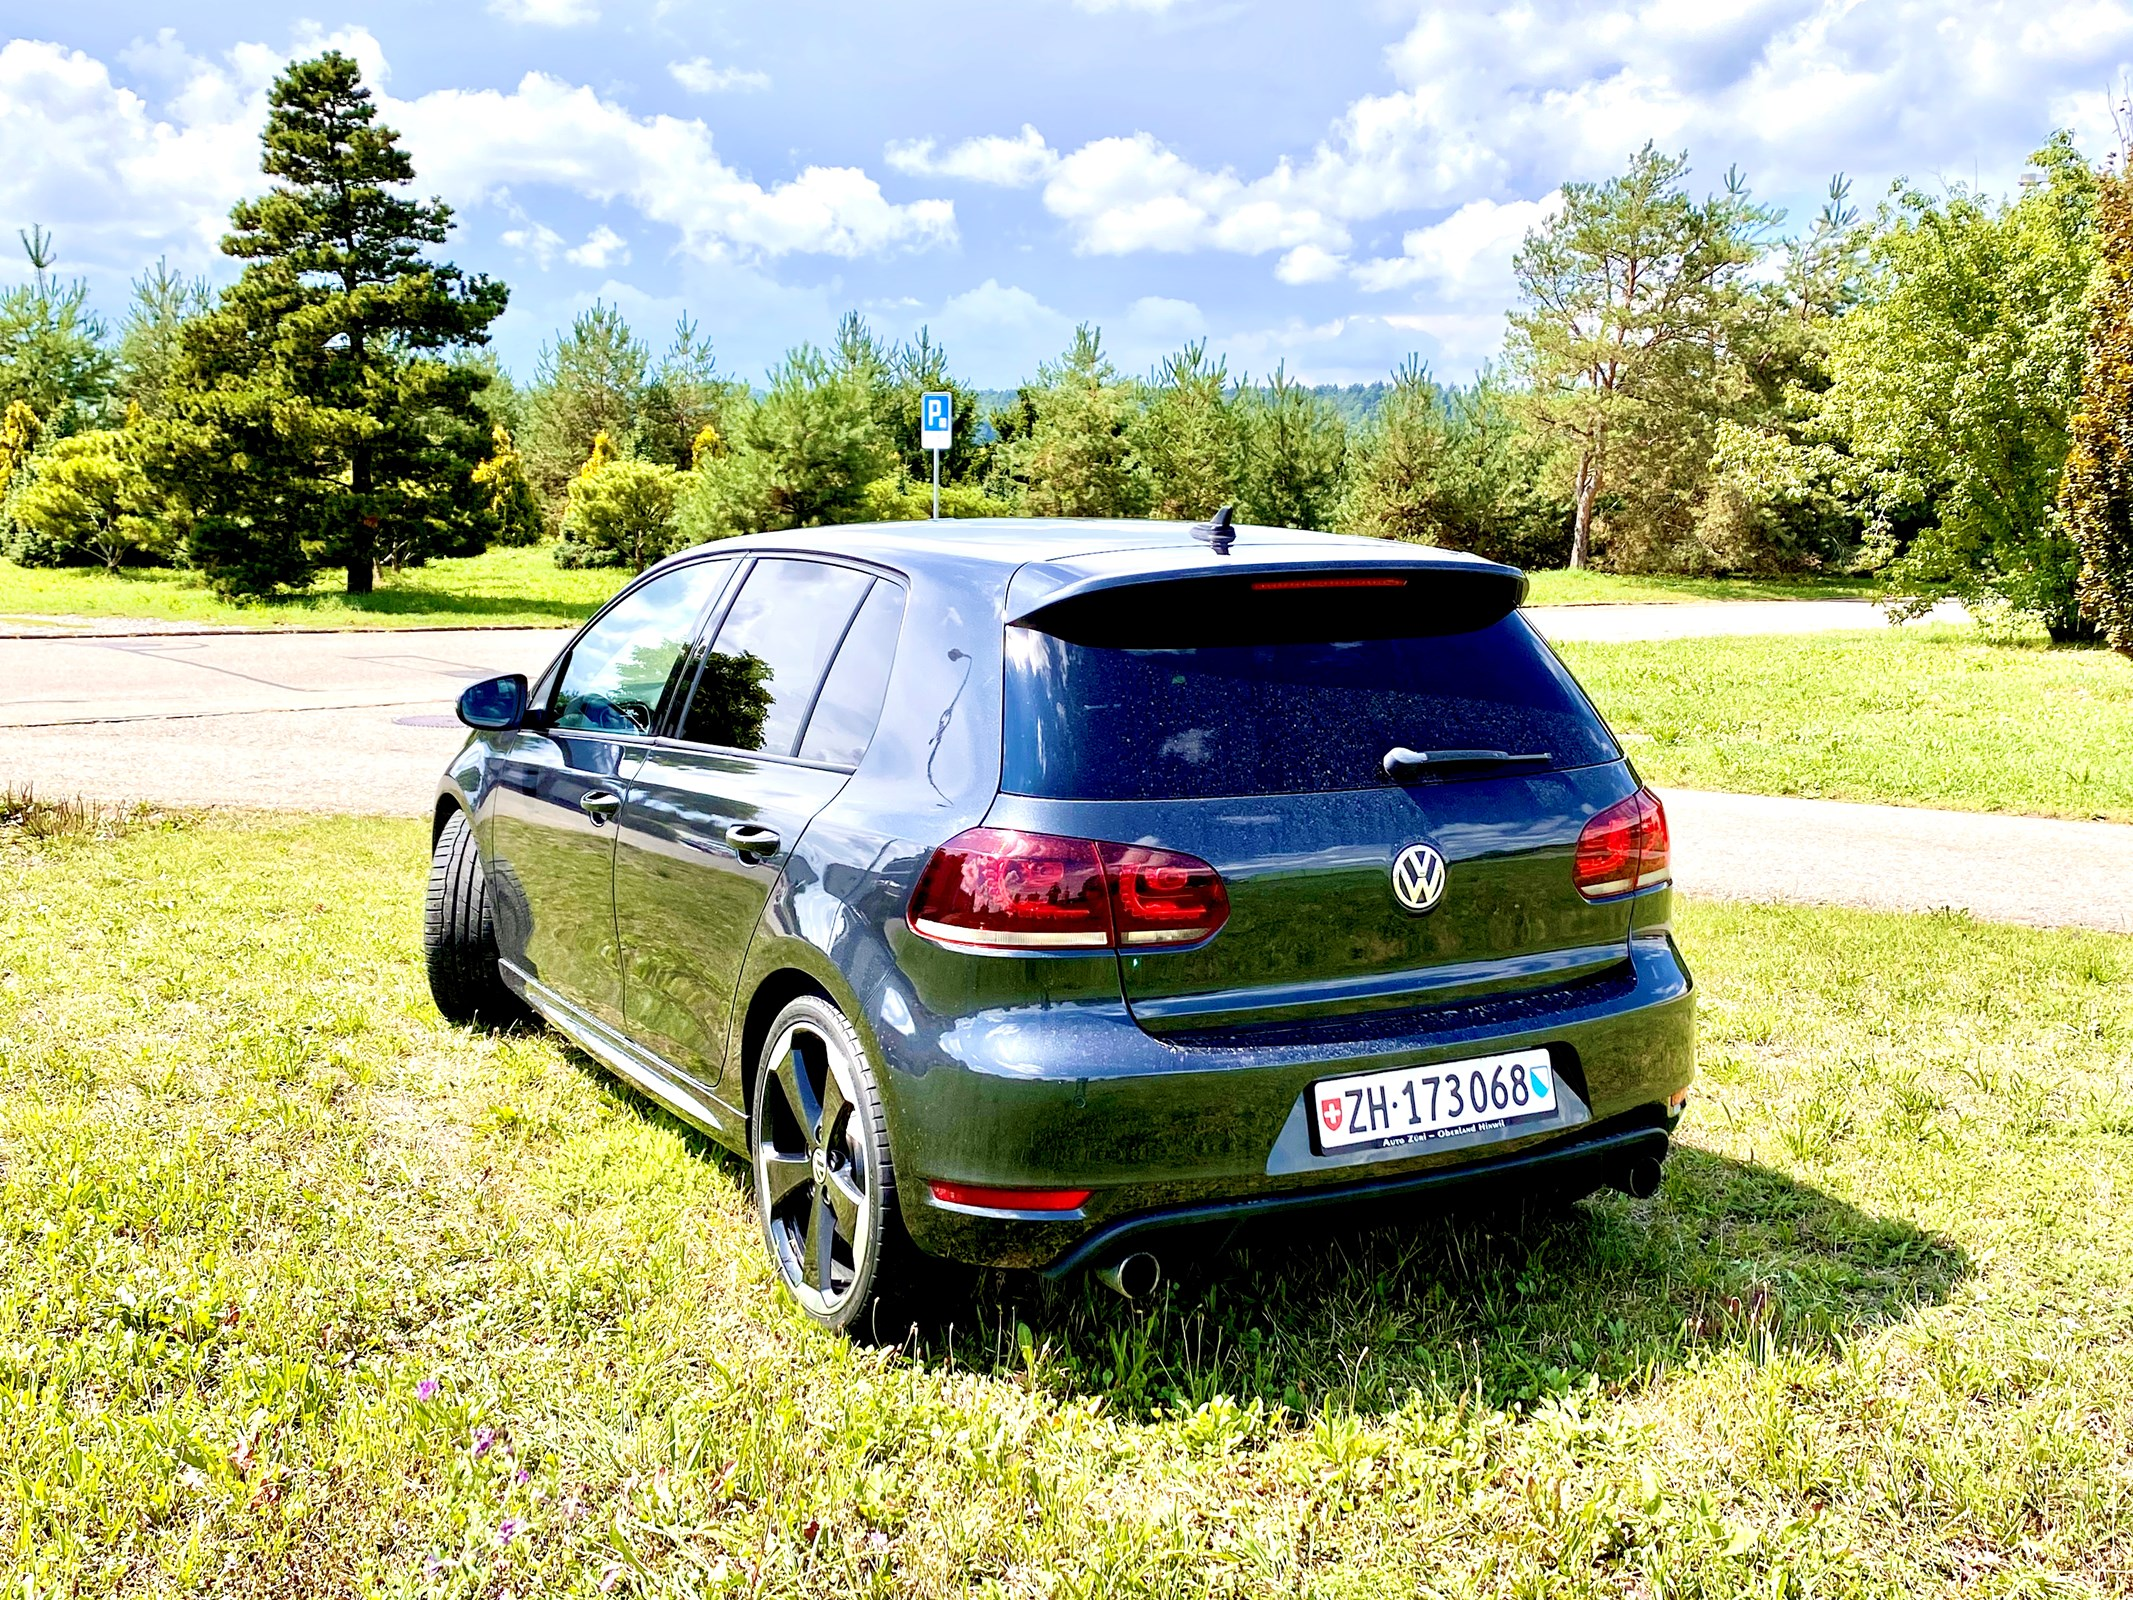 VW Golf VI 2.0 TSI GTI Edition 35 DSG